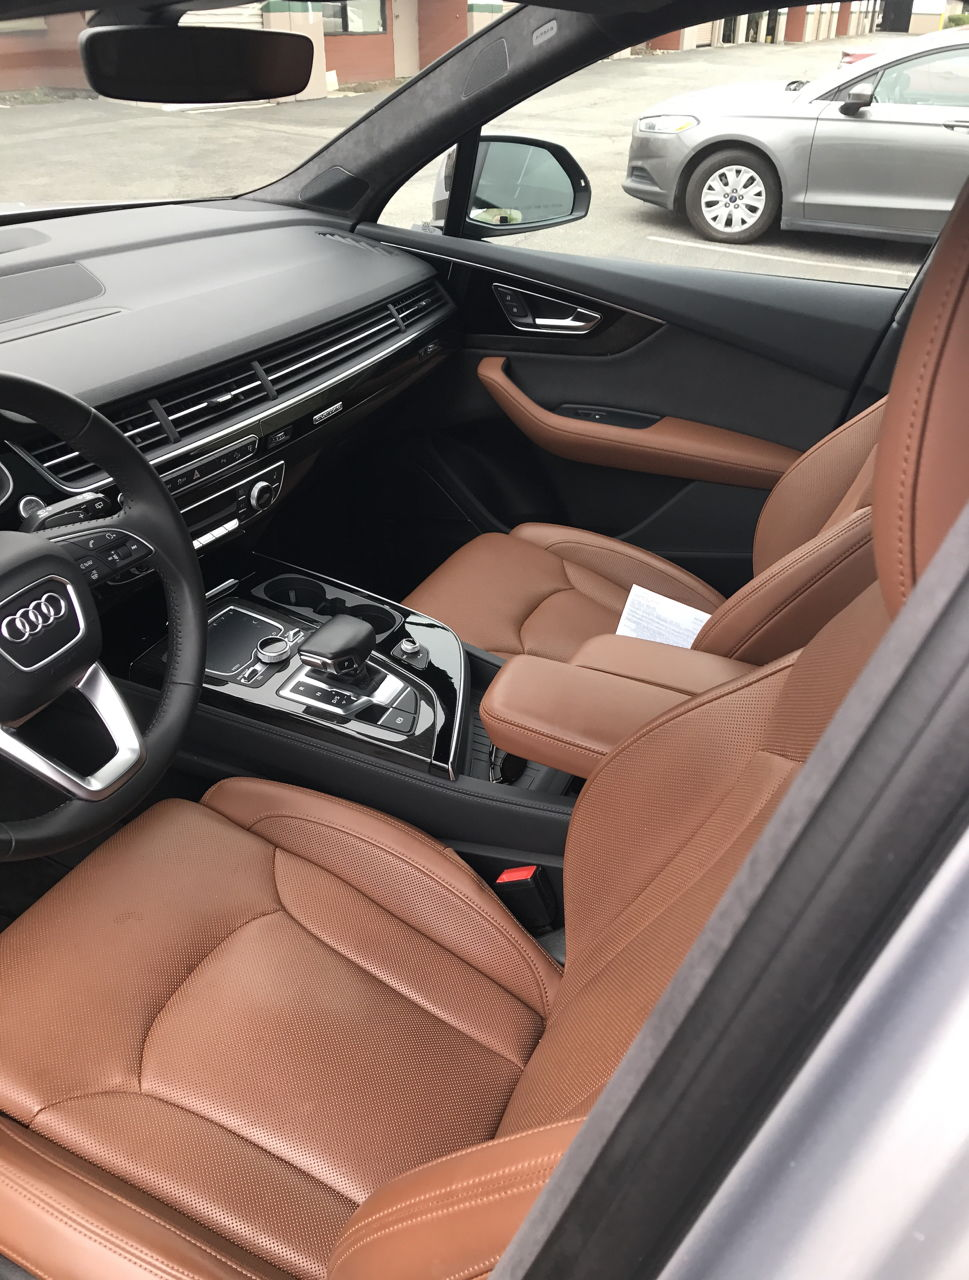 2017 Audi Q7 Cedar Brown Interior Www Indiepedia Org